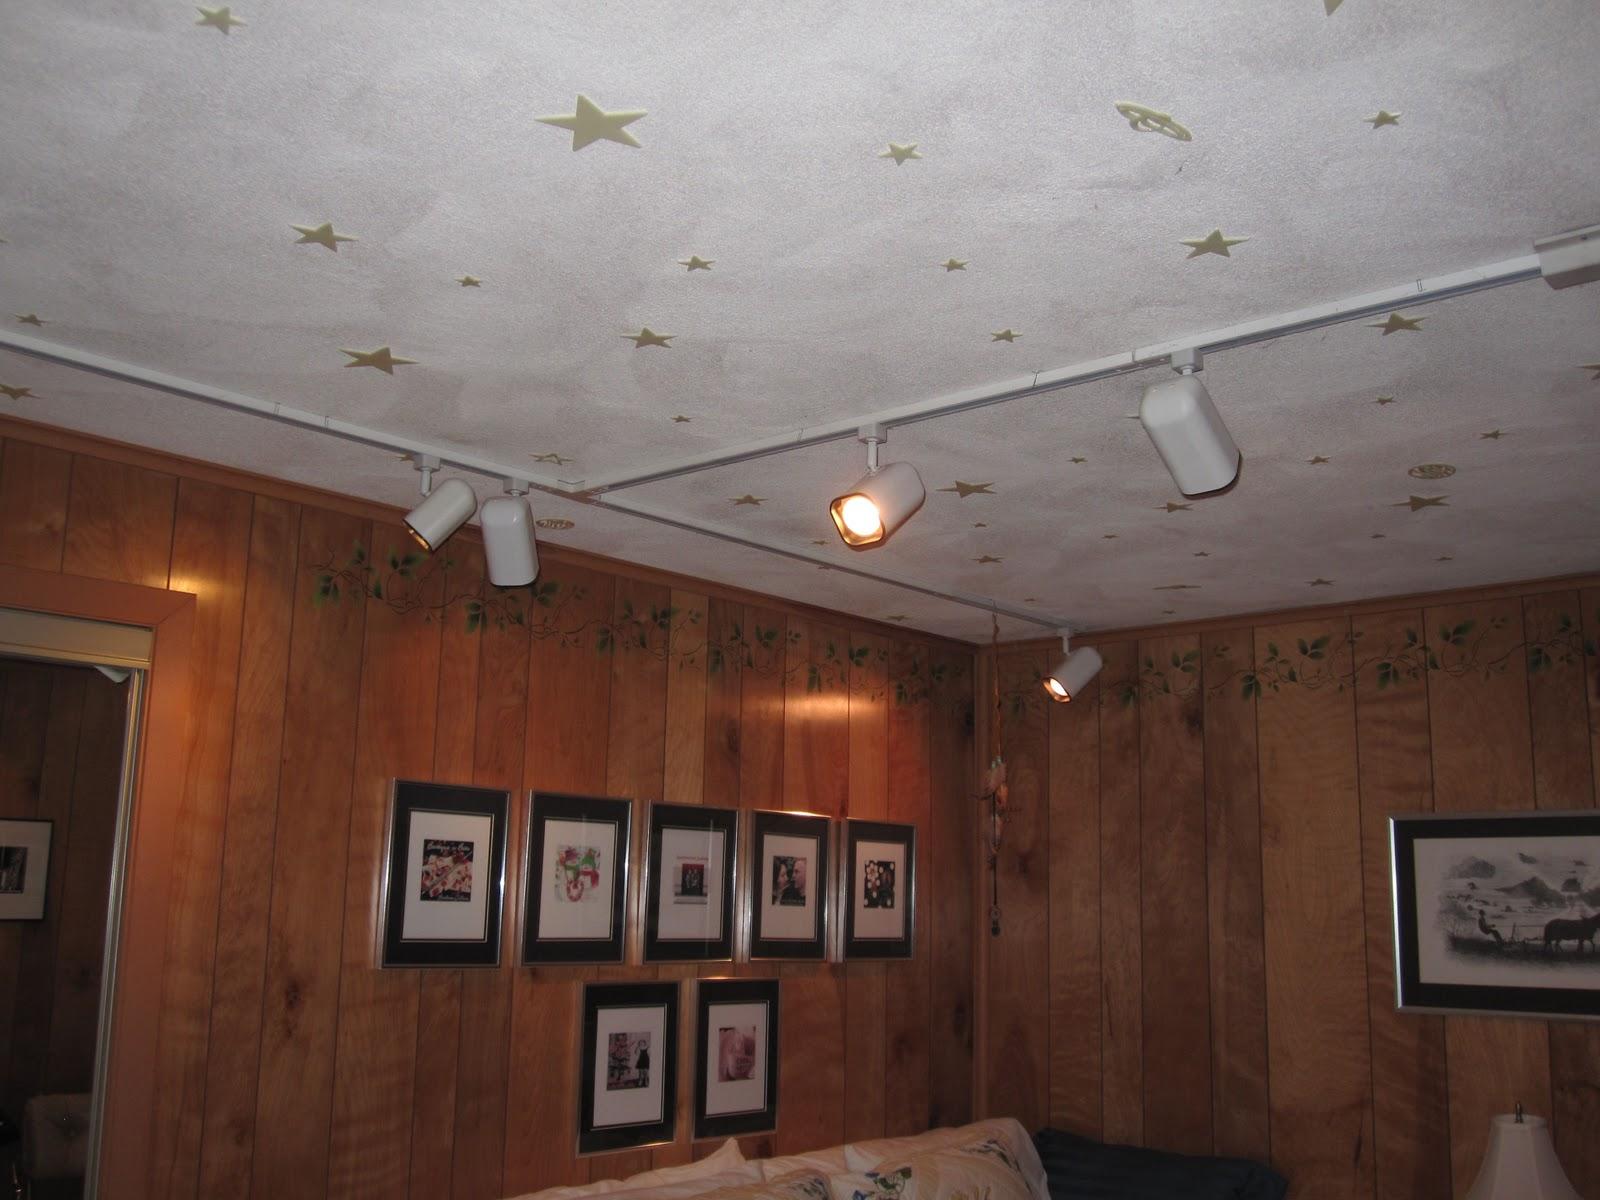 fluorescent ceiling lights photo - 1